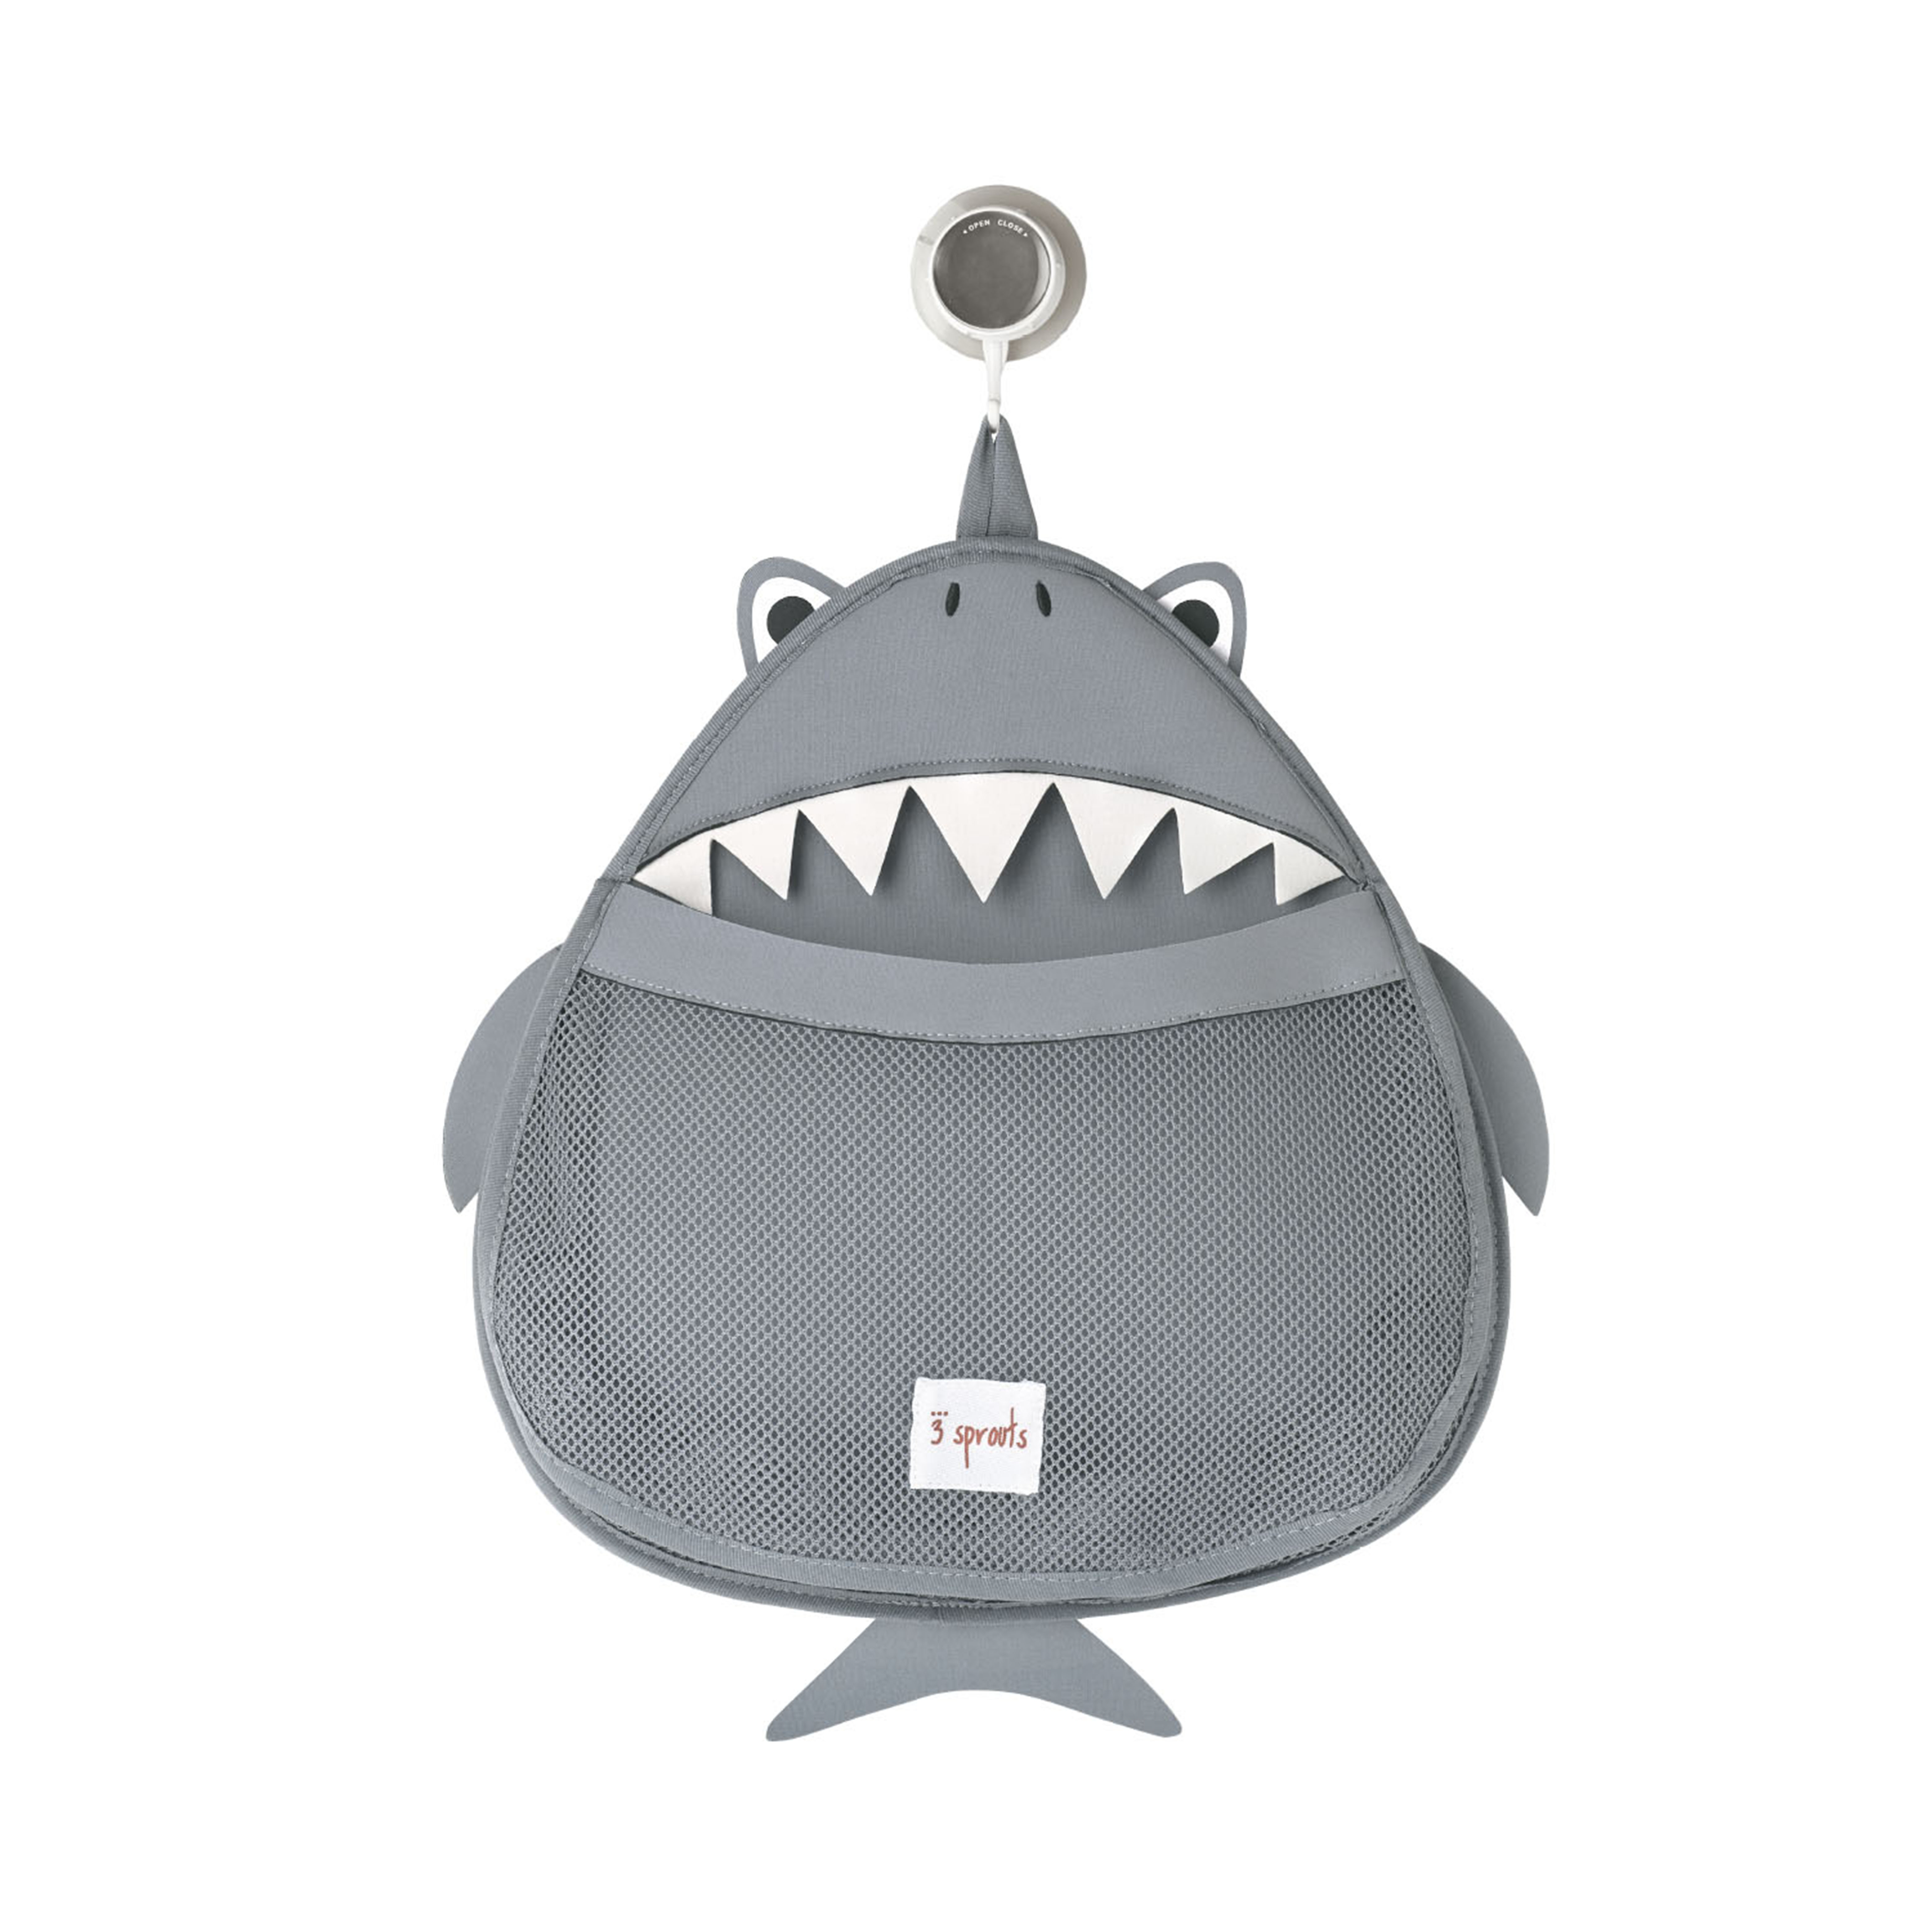 Bilde av 3 Sprouts - Bath Storage - Gray Shark